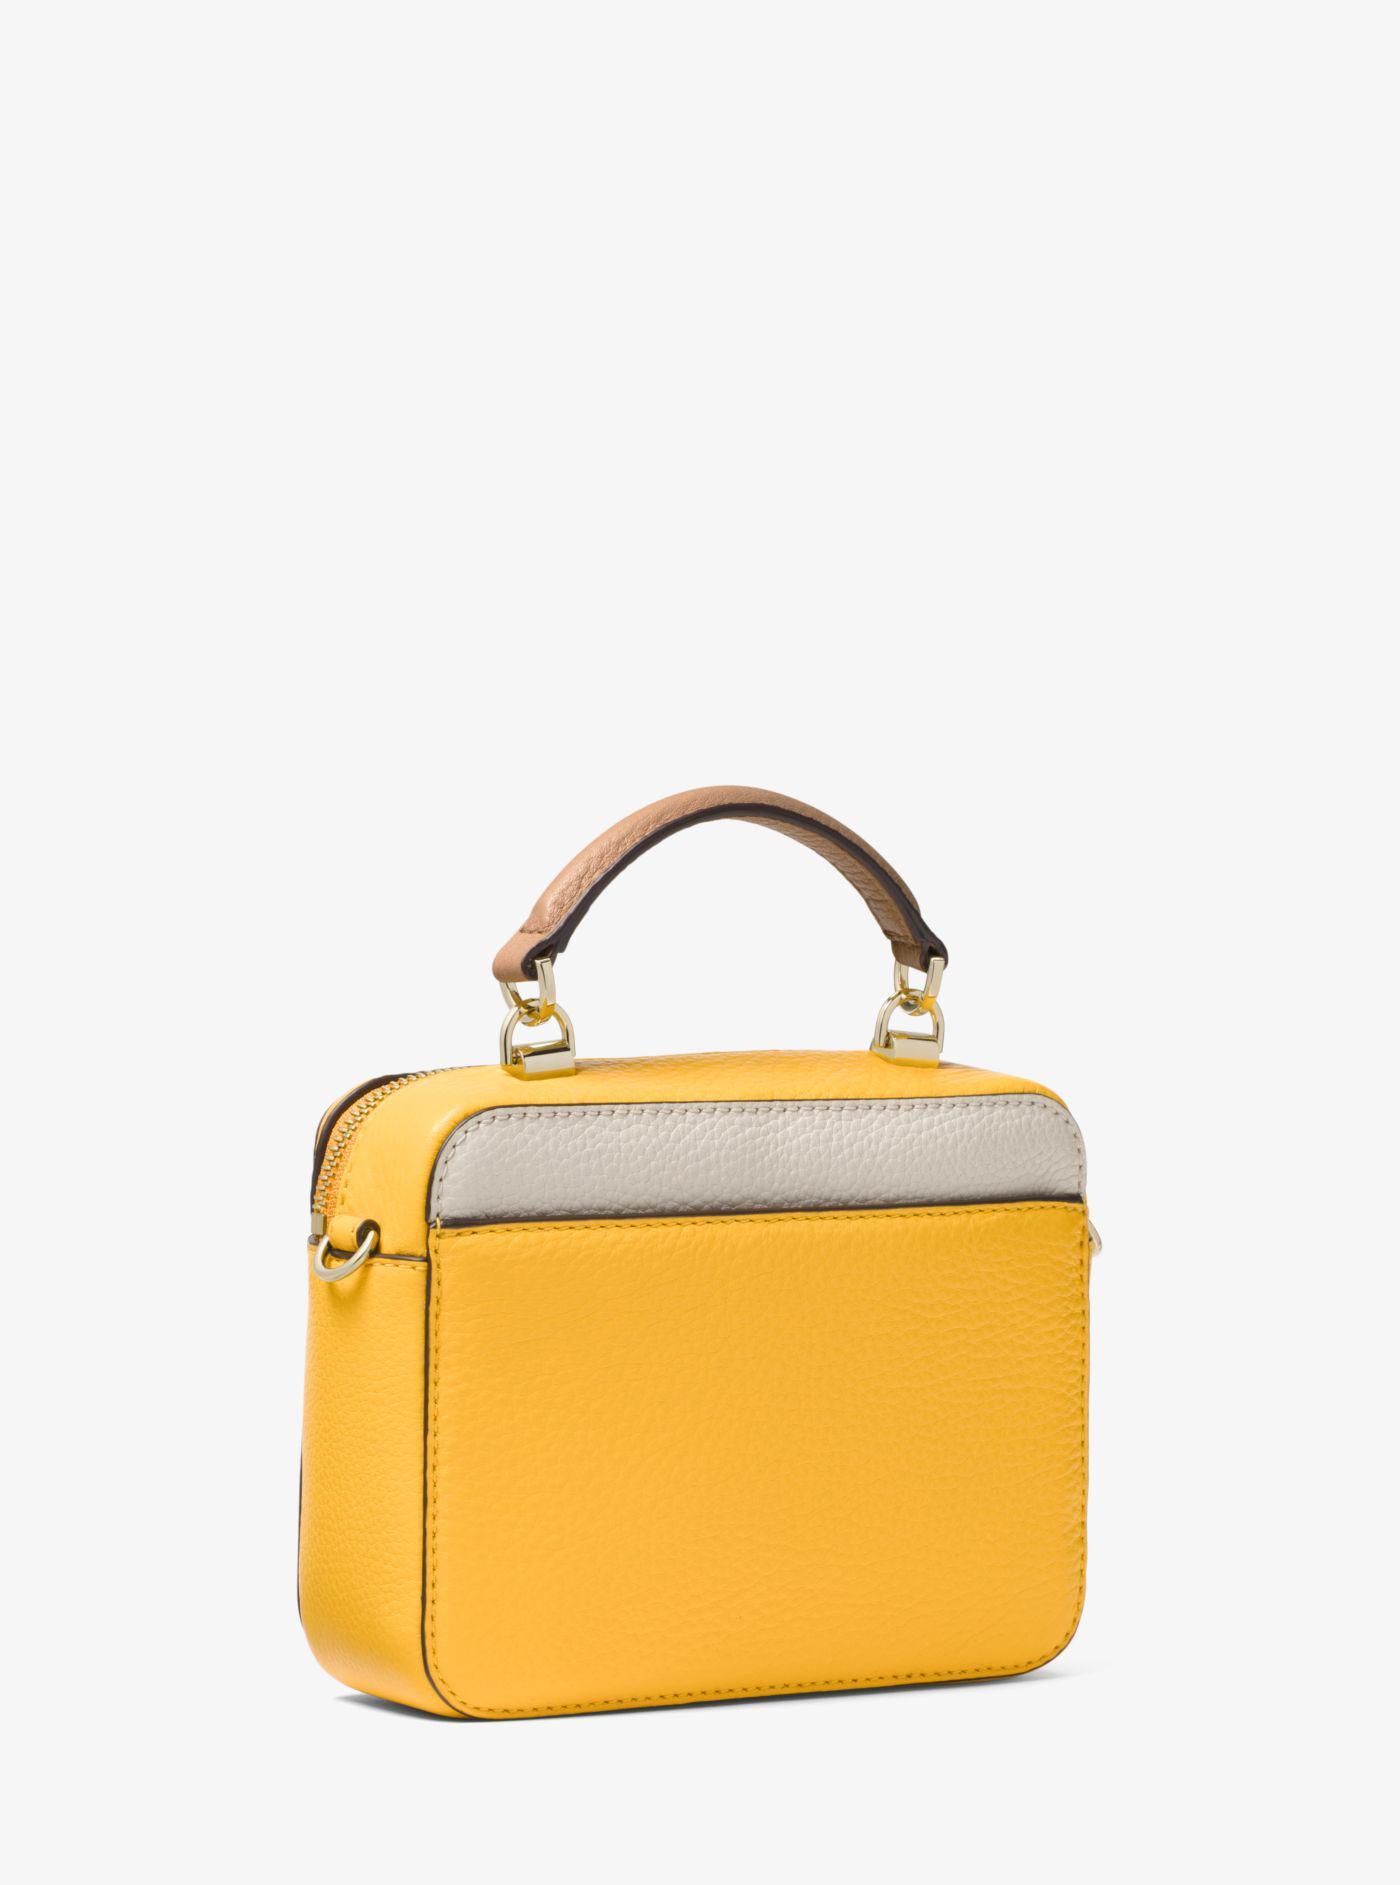 e9f9143a2921 Lyst - Michael Kors Mott Mini Color-block Pebbled Leather Crossbody Bag